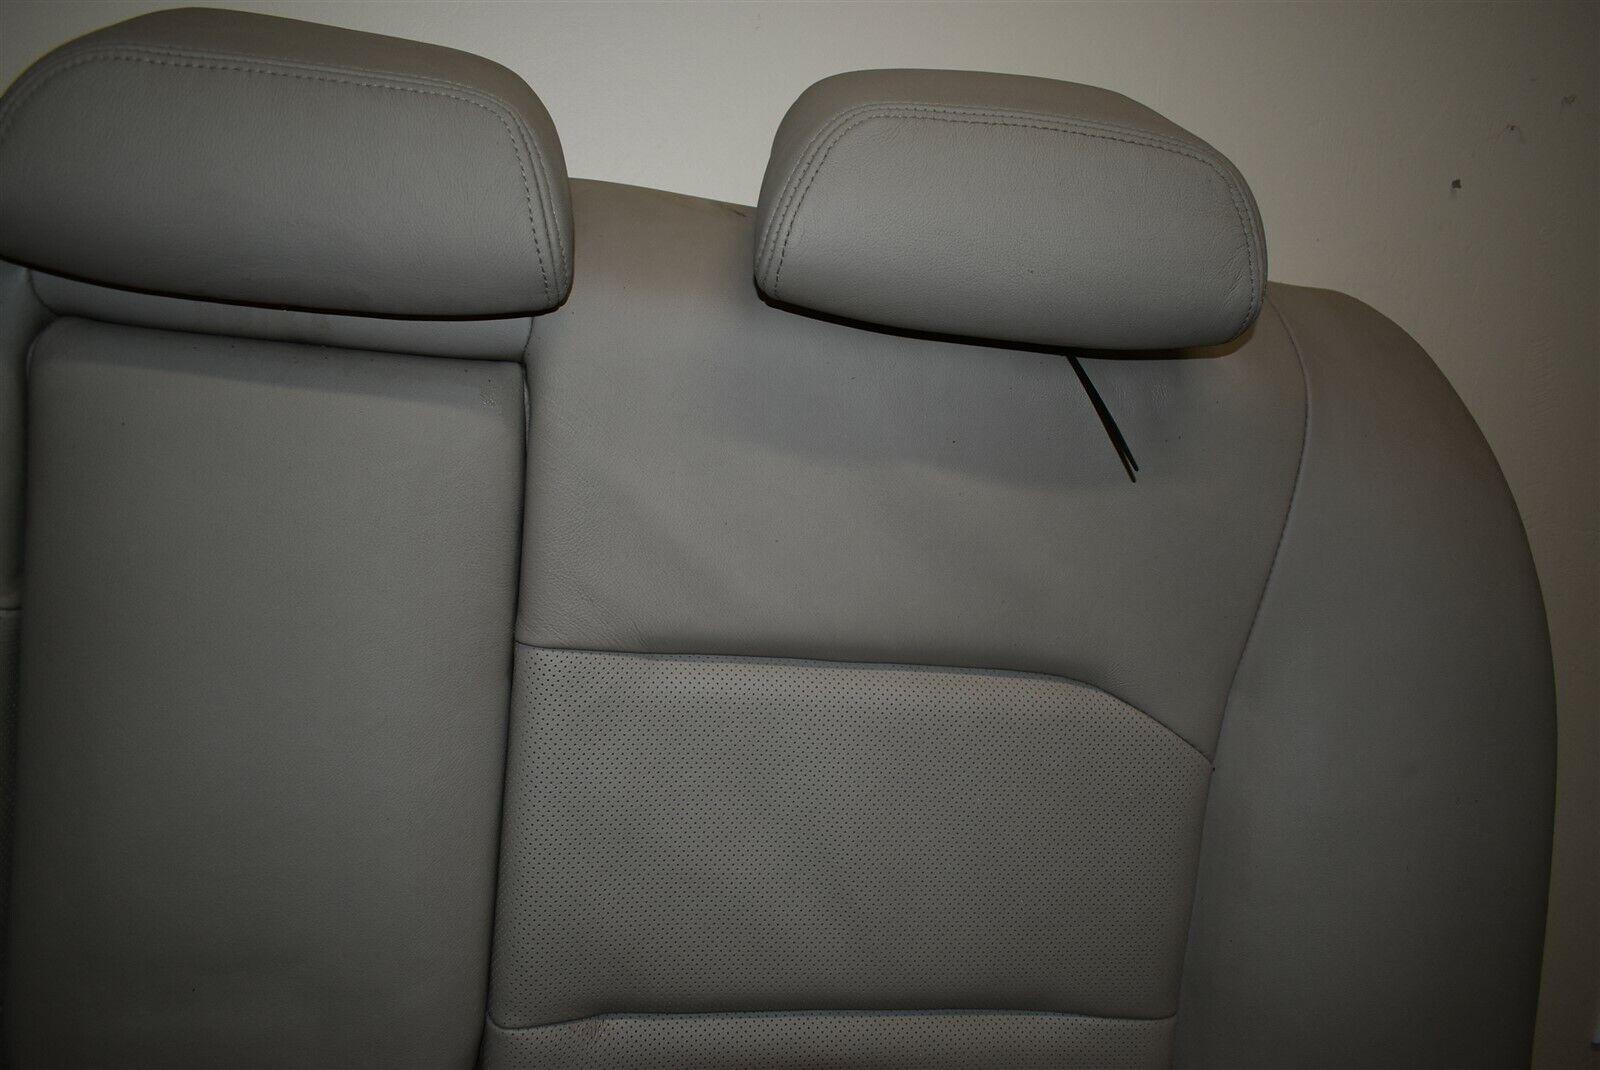 2005-2009 Subaru Legacy GT Seat Cushion Rear Upper Back Right Passenger RH 05-09